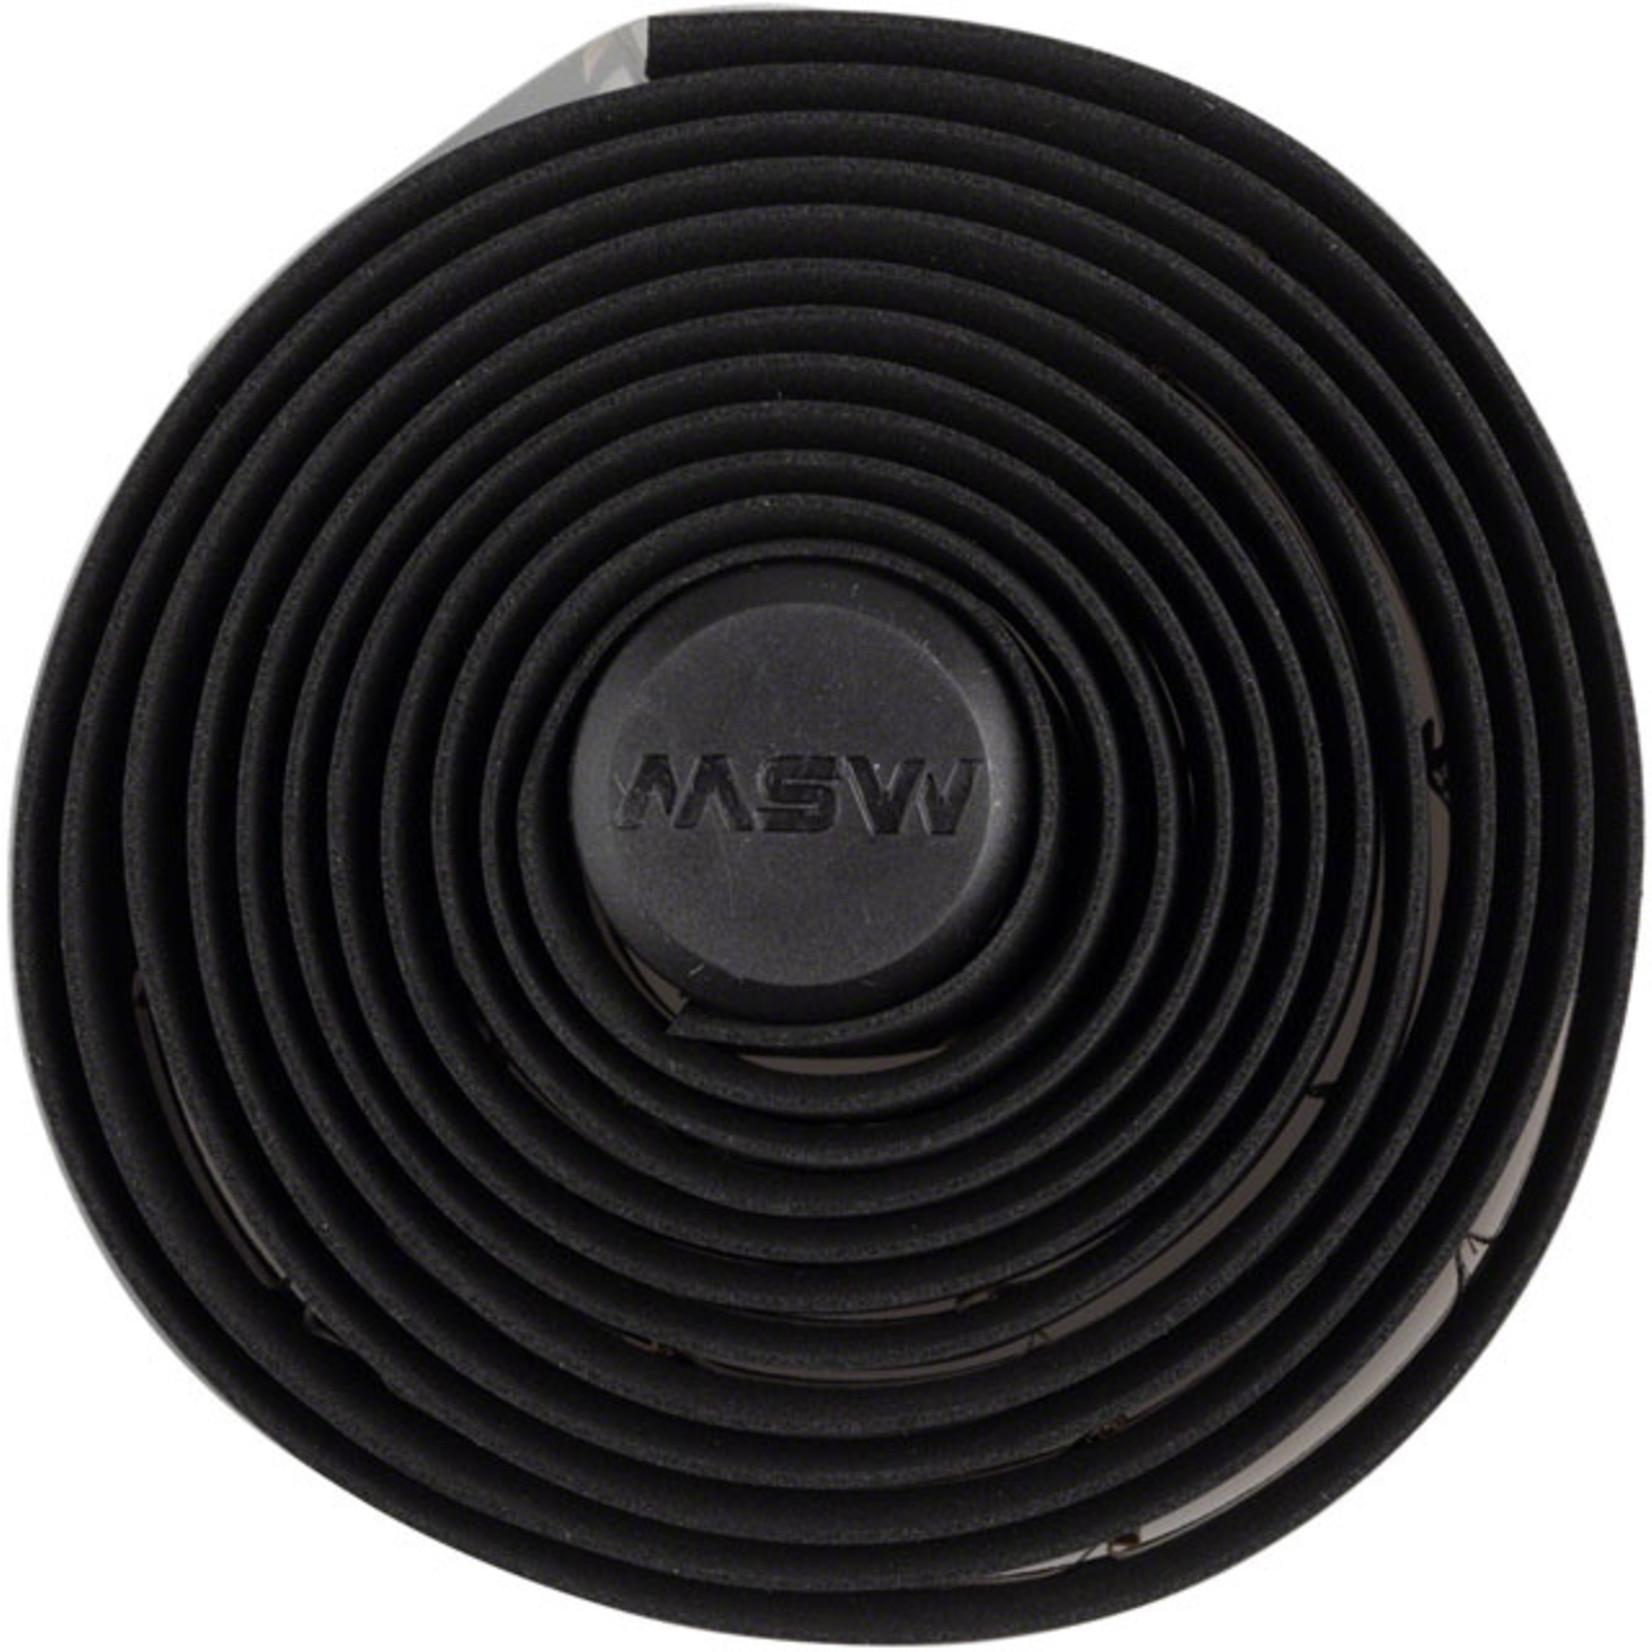 MSW Black Basic Bar tape